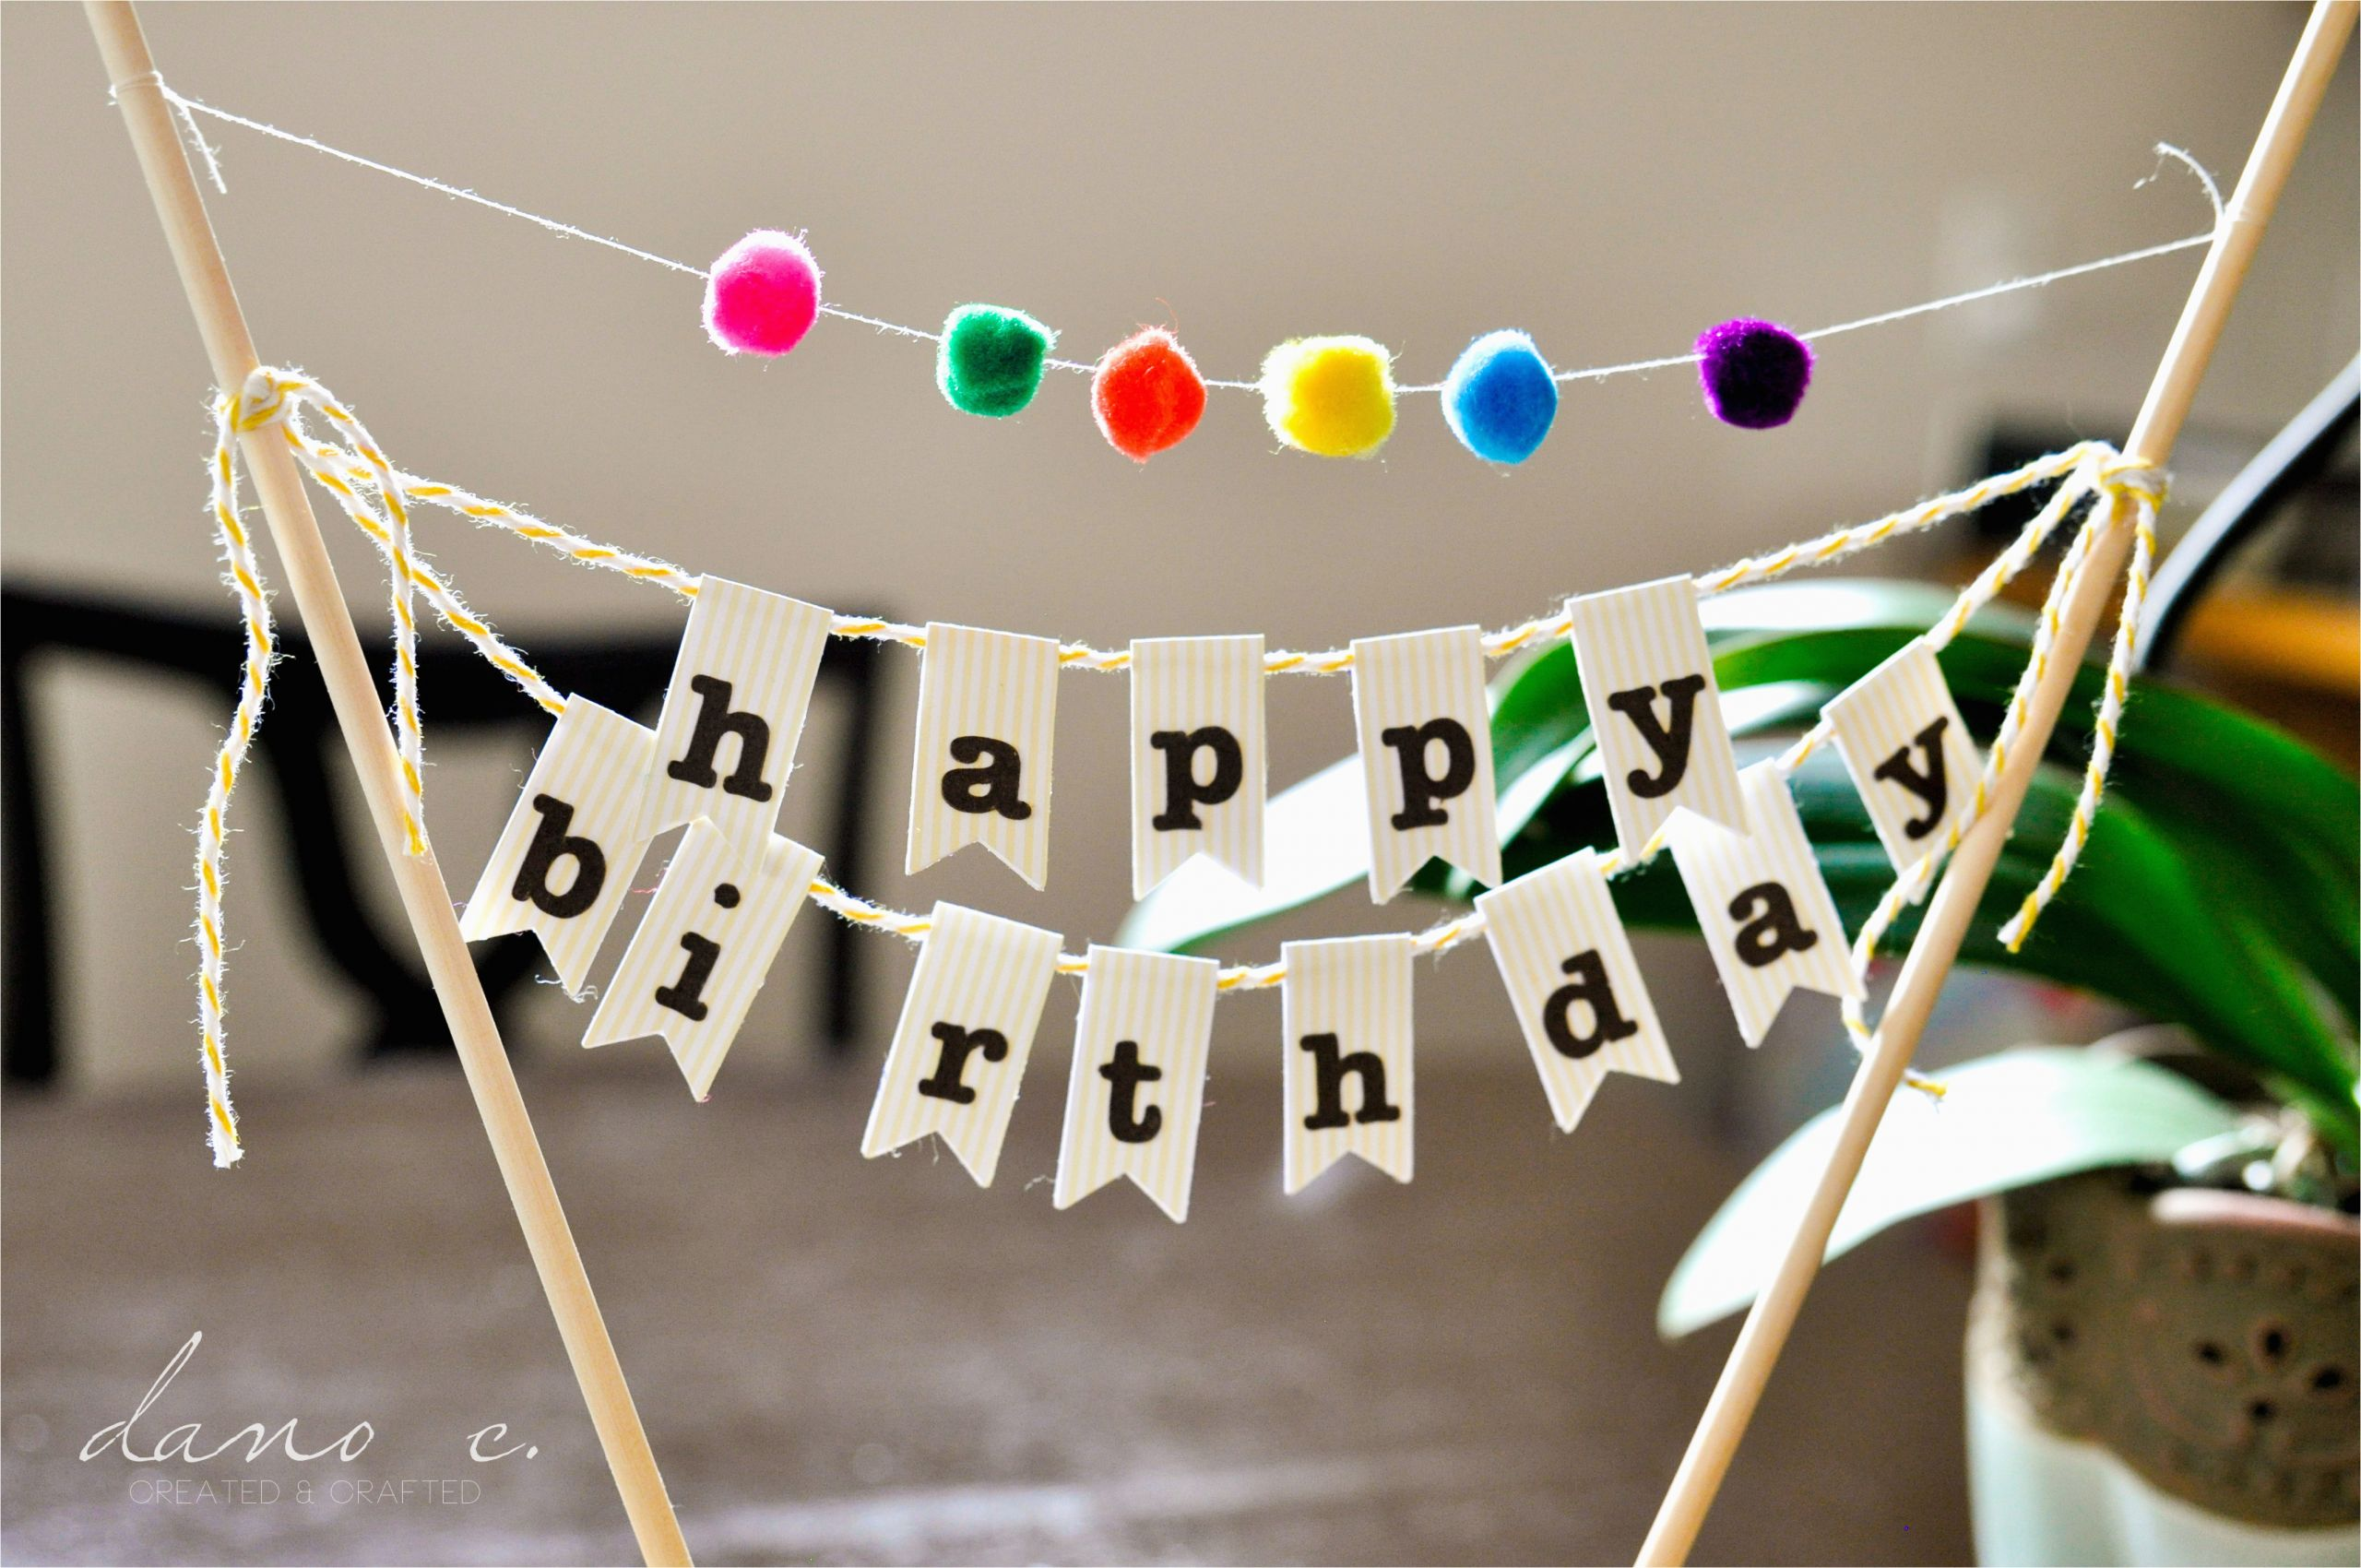 diy birthday cake banner with pom poms